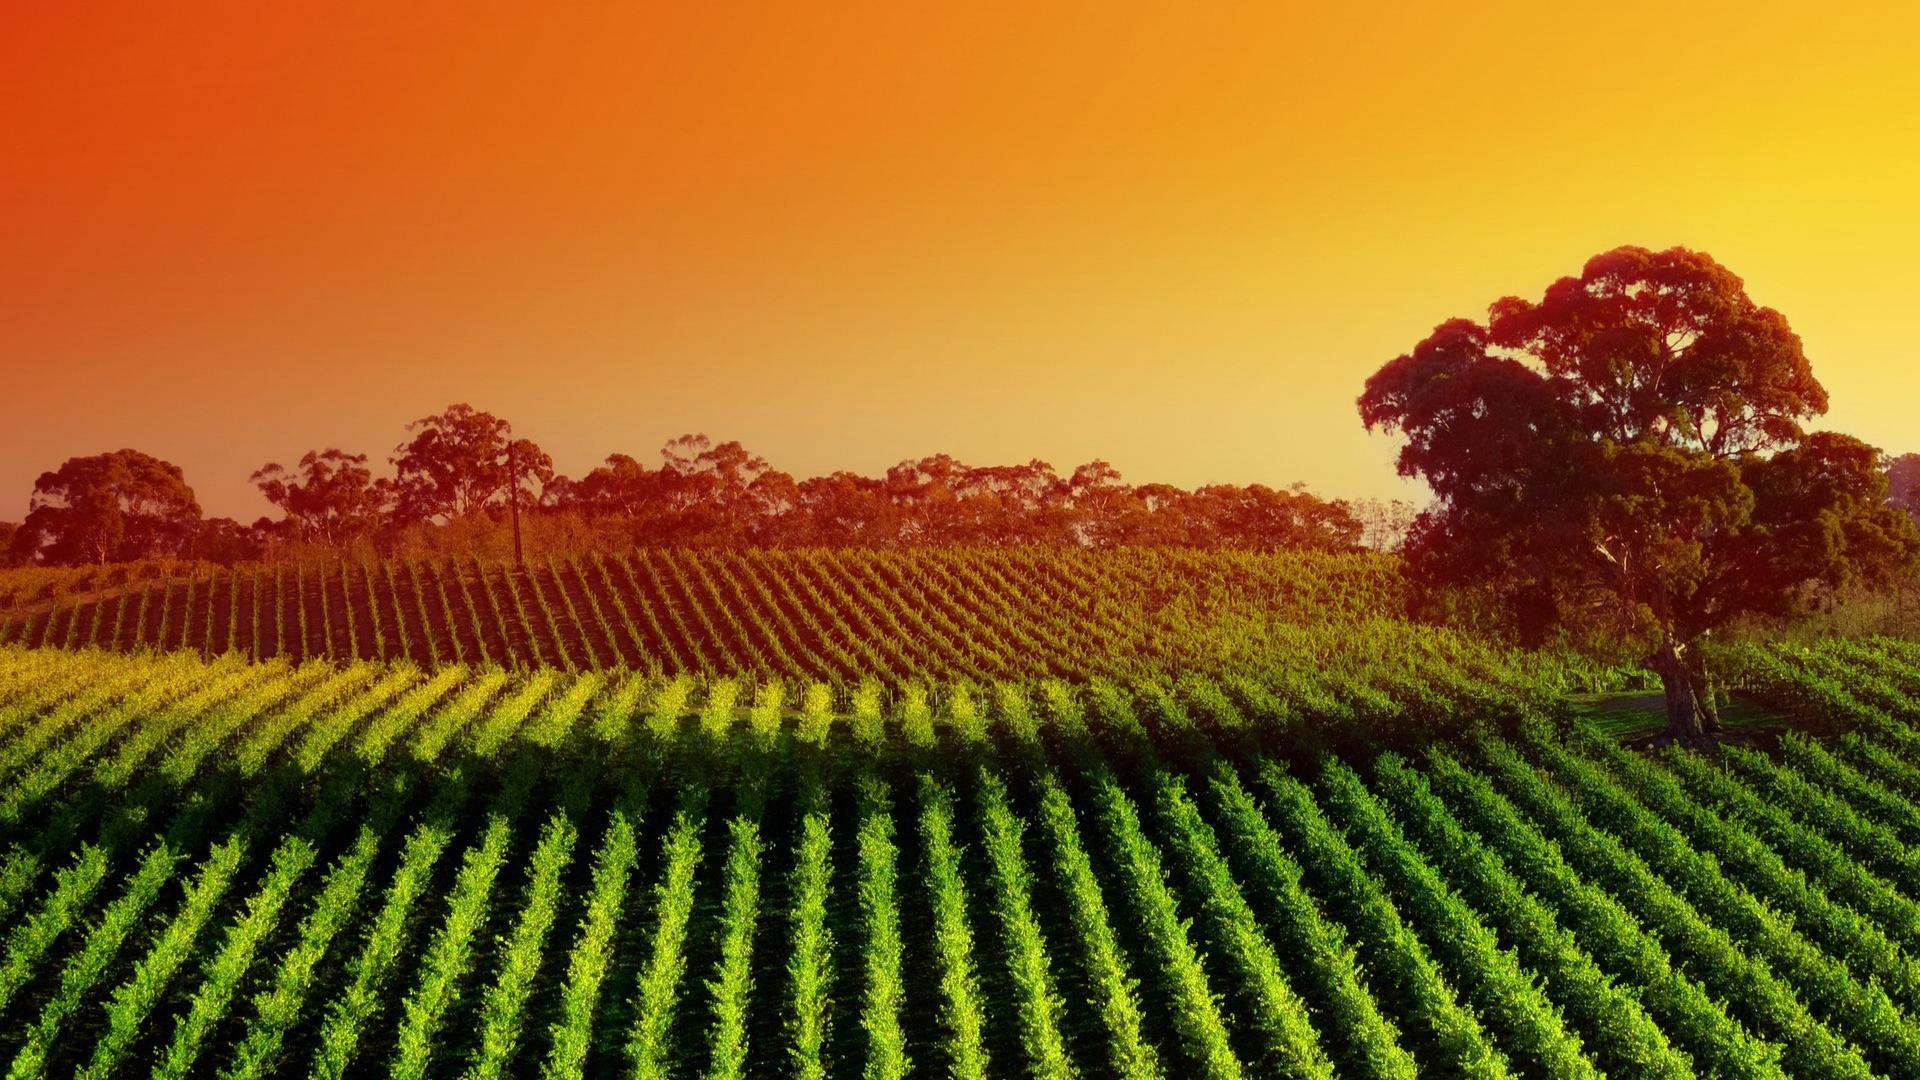 Vineyard Wallpaper 1920x1080 67184